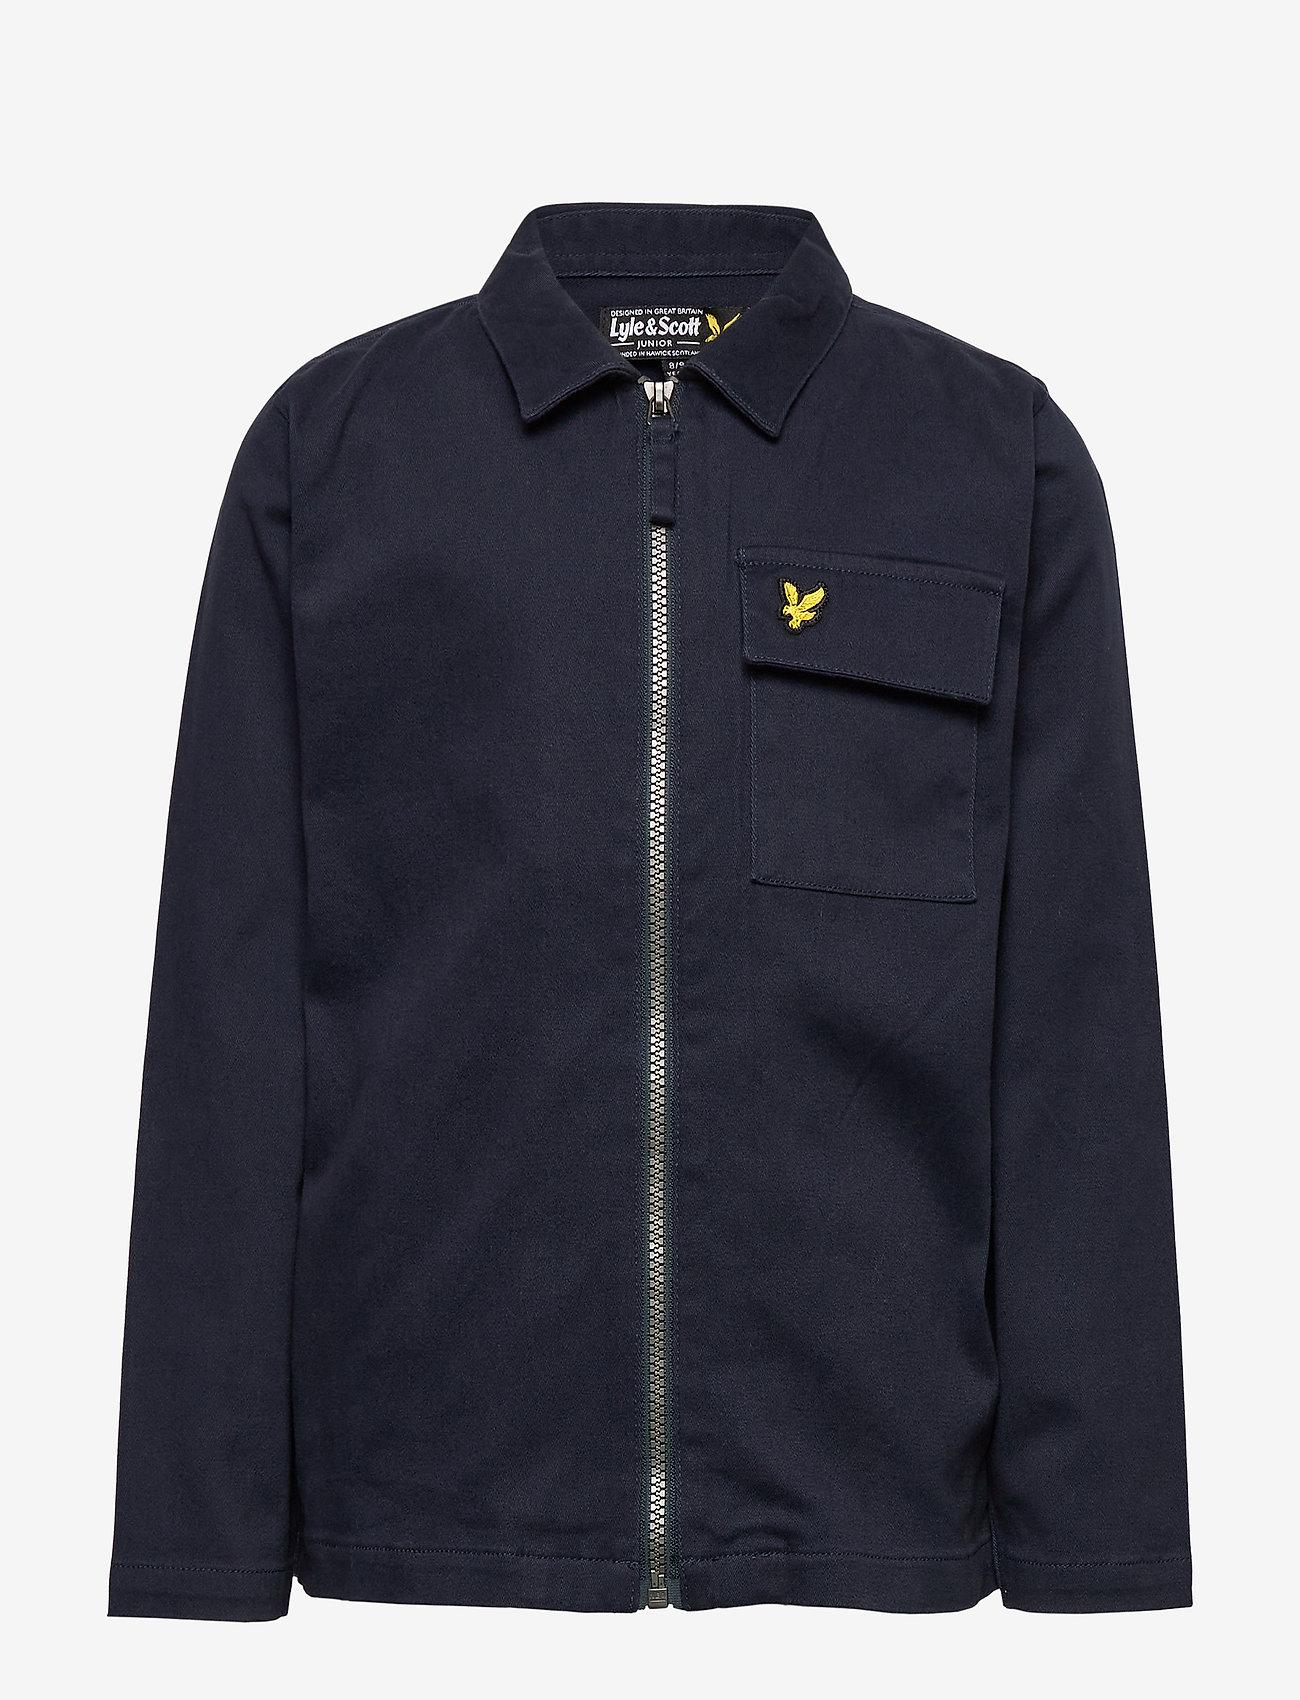 Lyle & Scott Junior - Oxford Long Sleeve Shirt Navy Blazer - bleiserit - navy blazer - 0